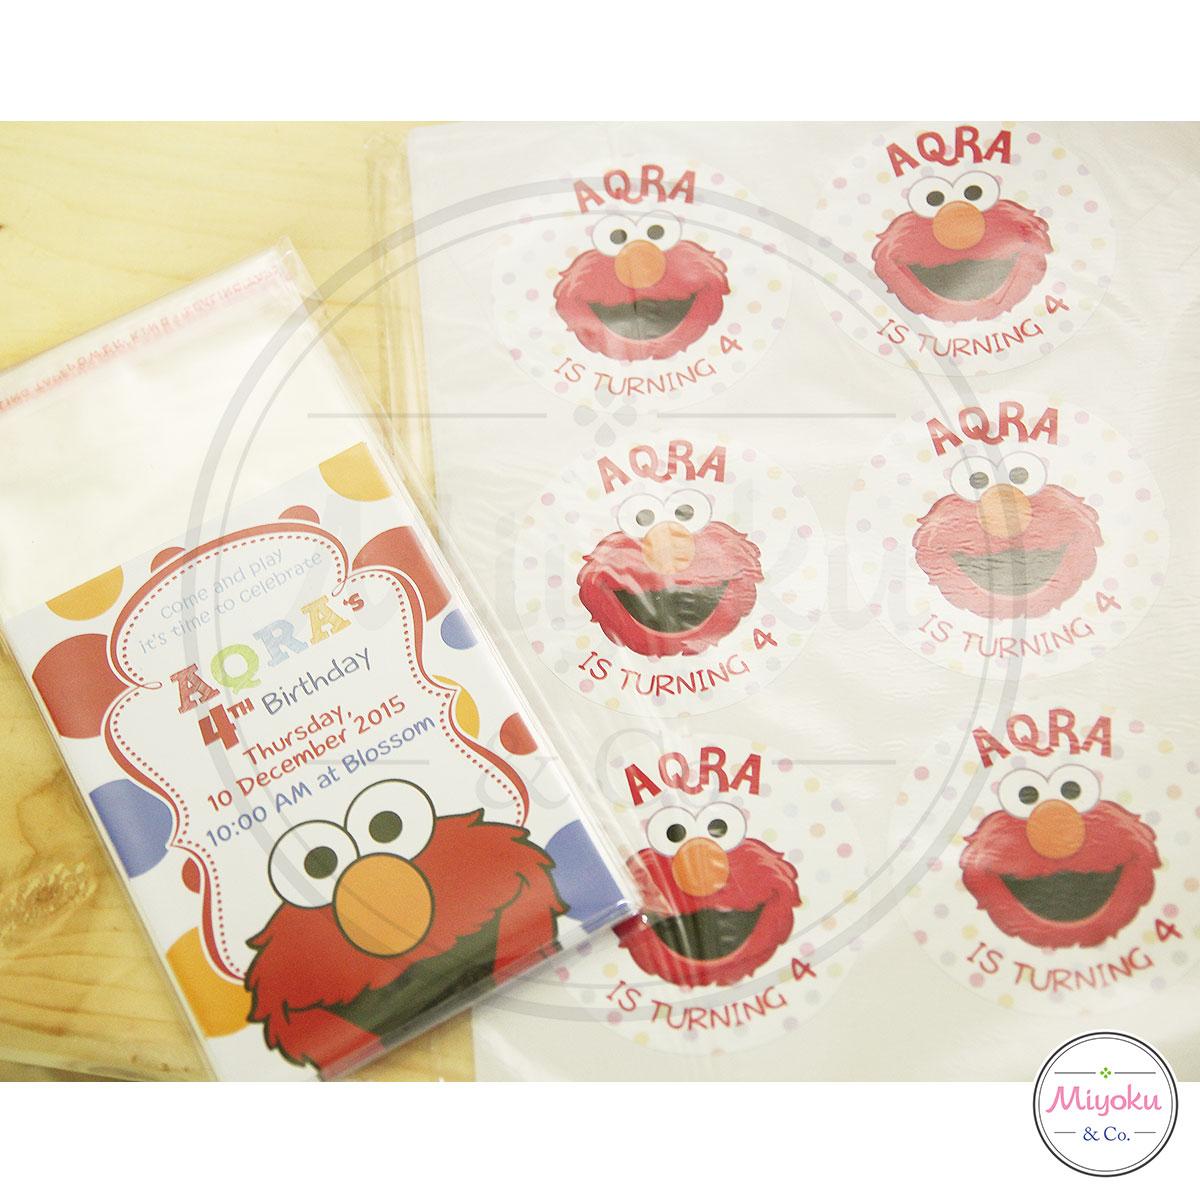 Comment on this picture ulang tahun anak contoh undangan kartu apps - Undangan Ulang Tahun Elmo